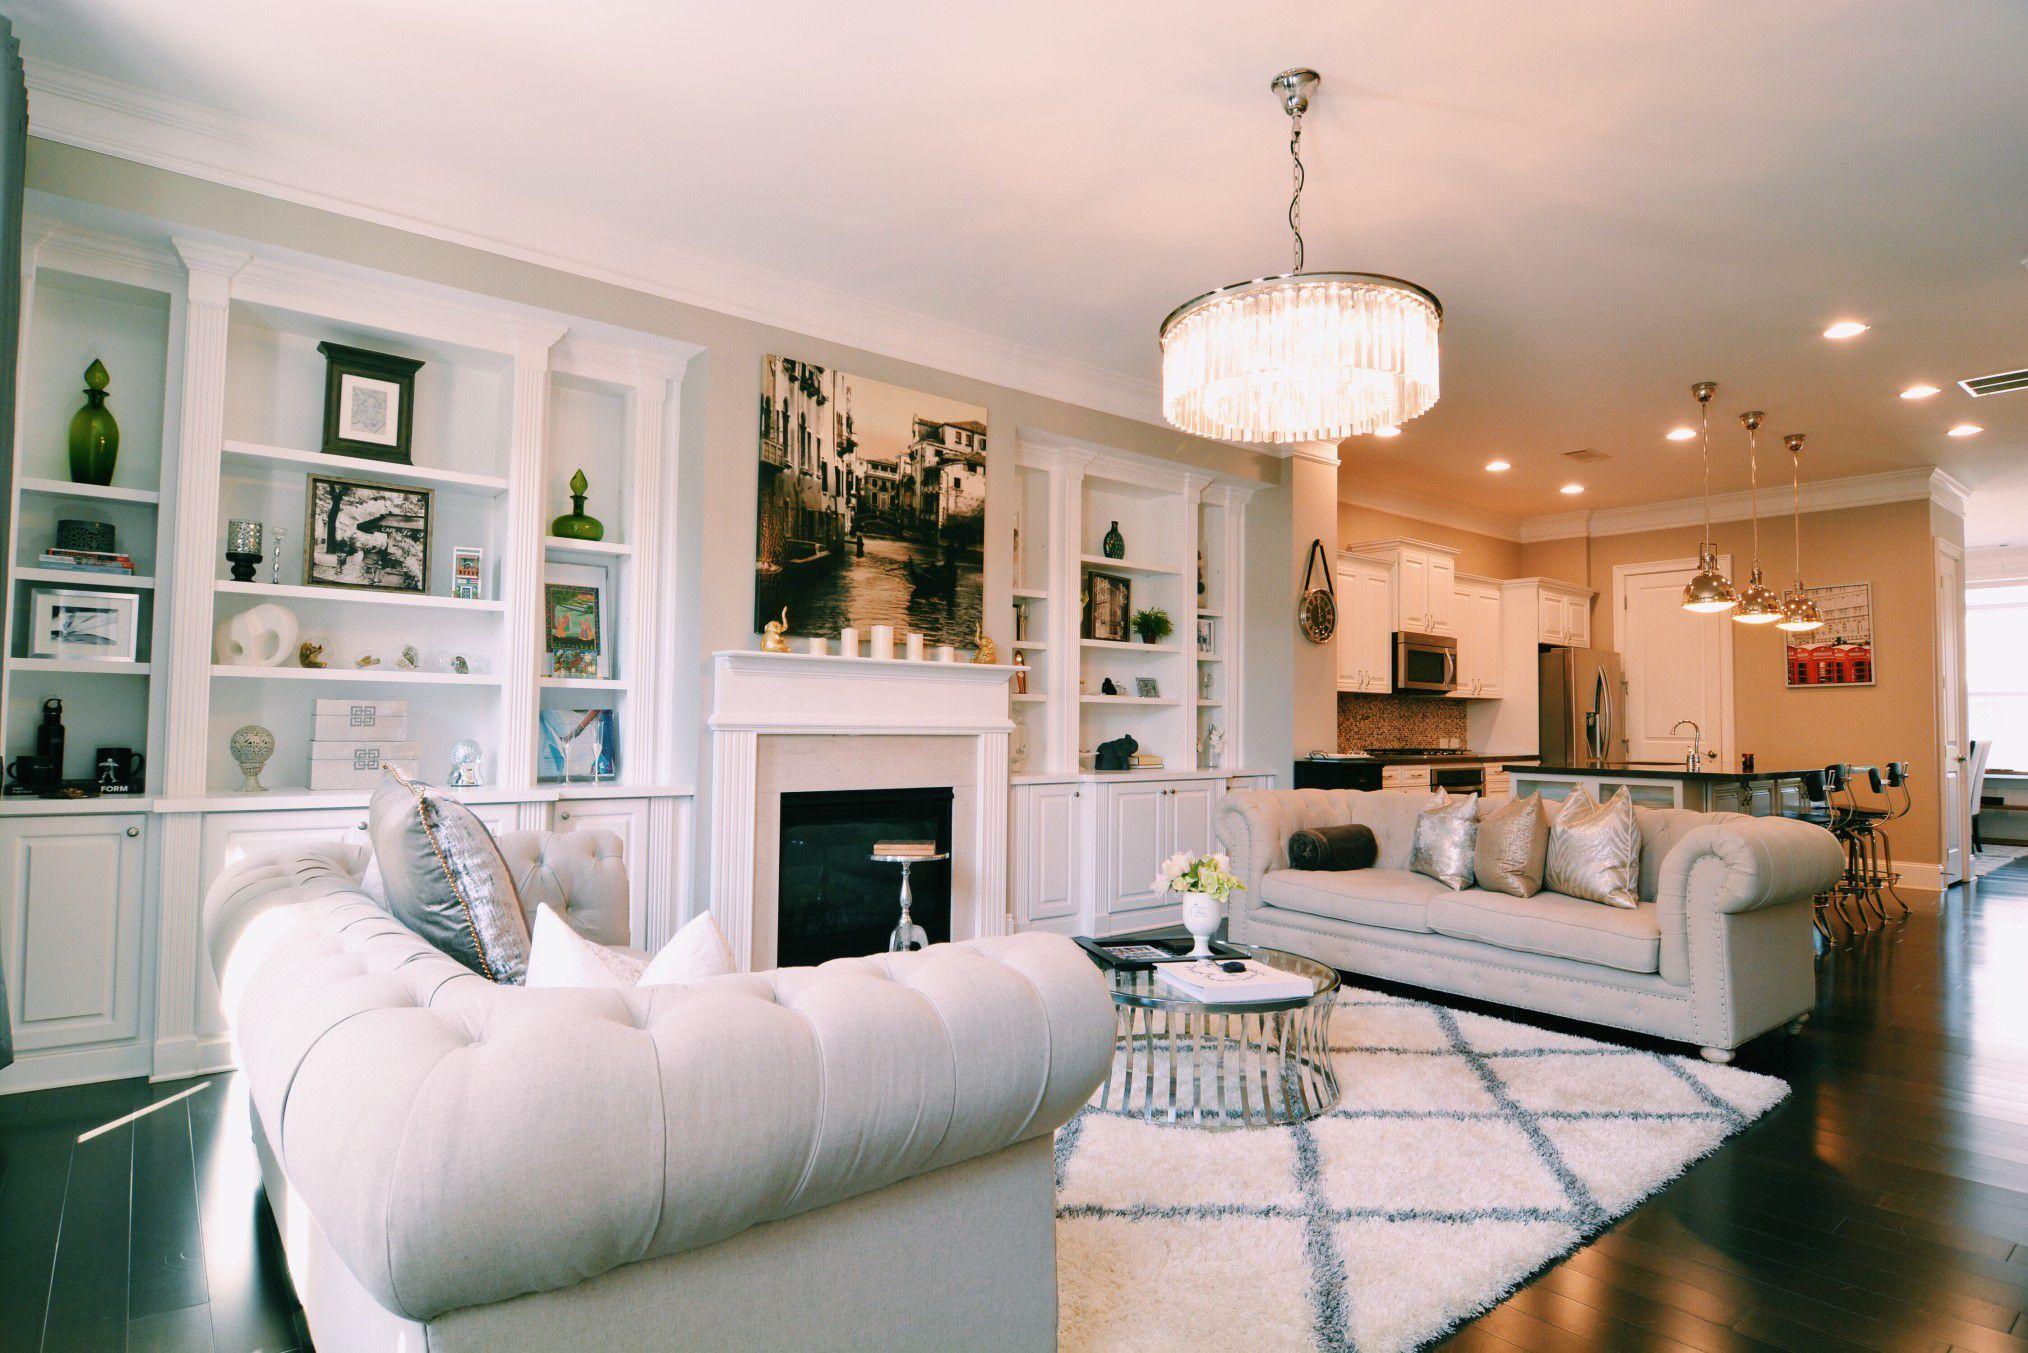 10 Rules For Arranging Living Room Furniture Livingroom Layout Narrow Living Room Living Room Arrangements Living room furniture arrangement